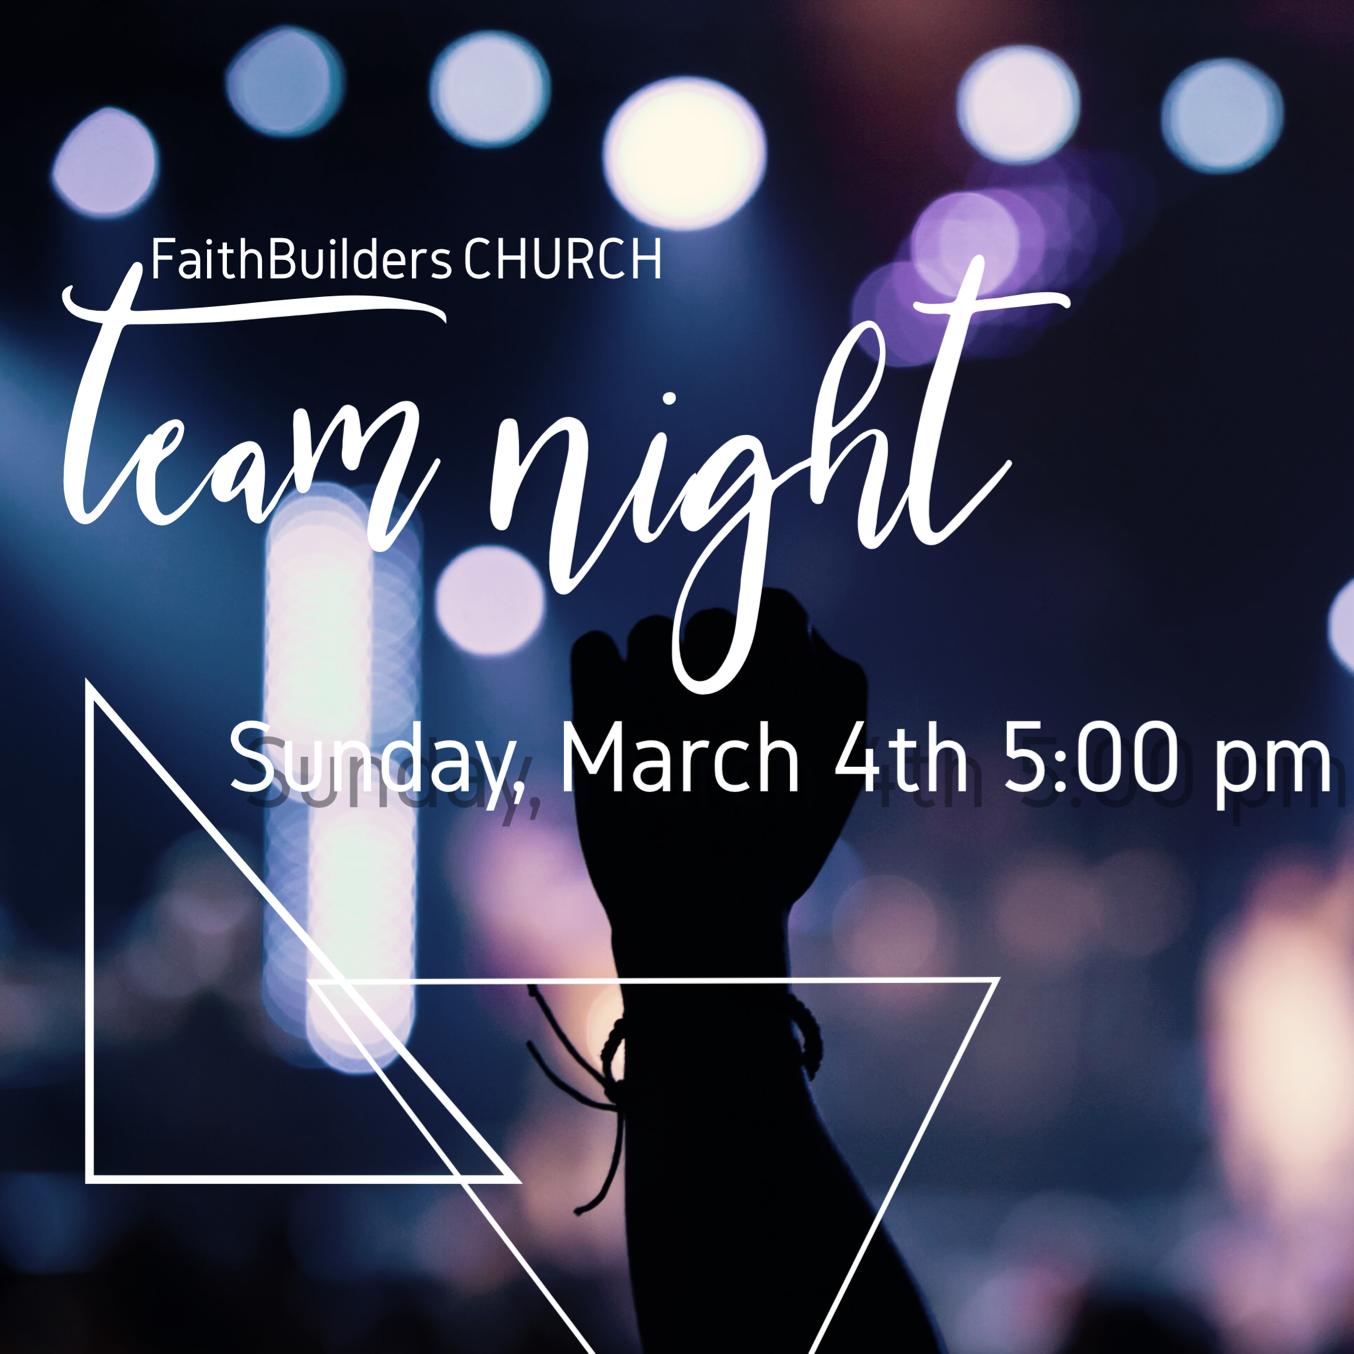 Team Night - Vision & Creativity